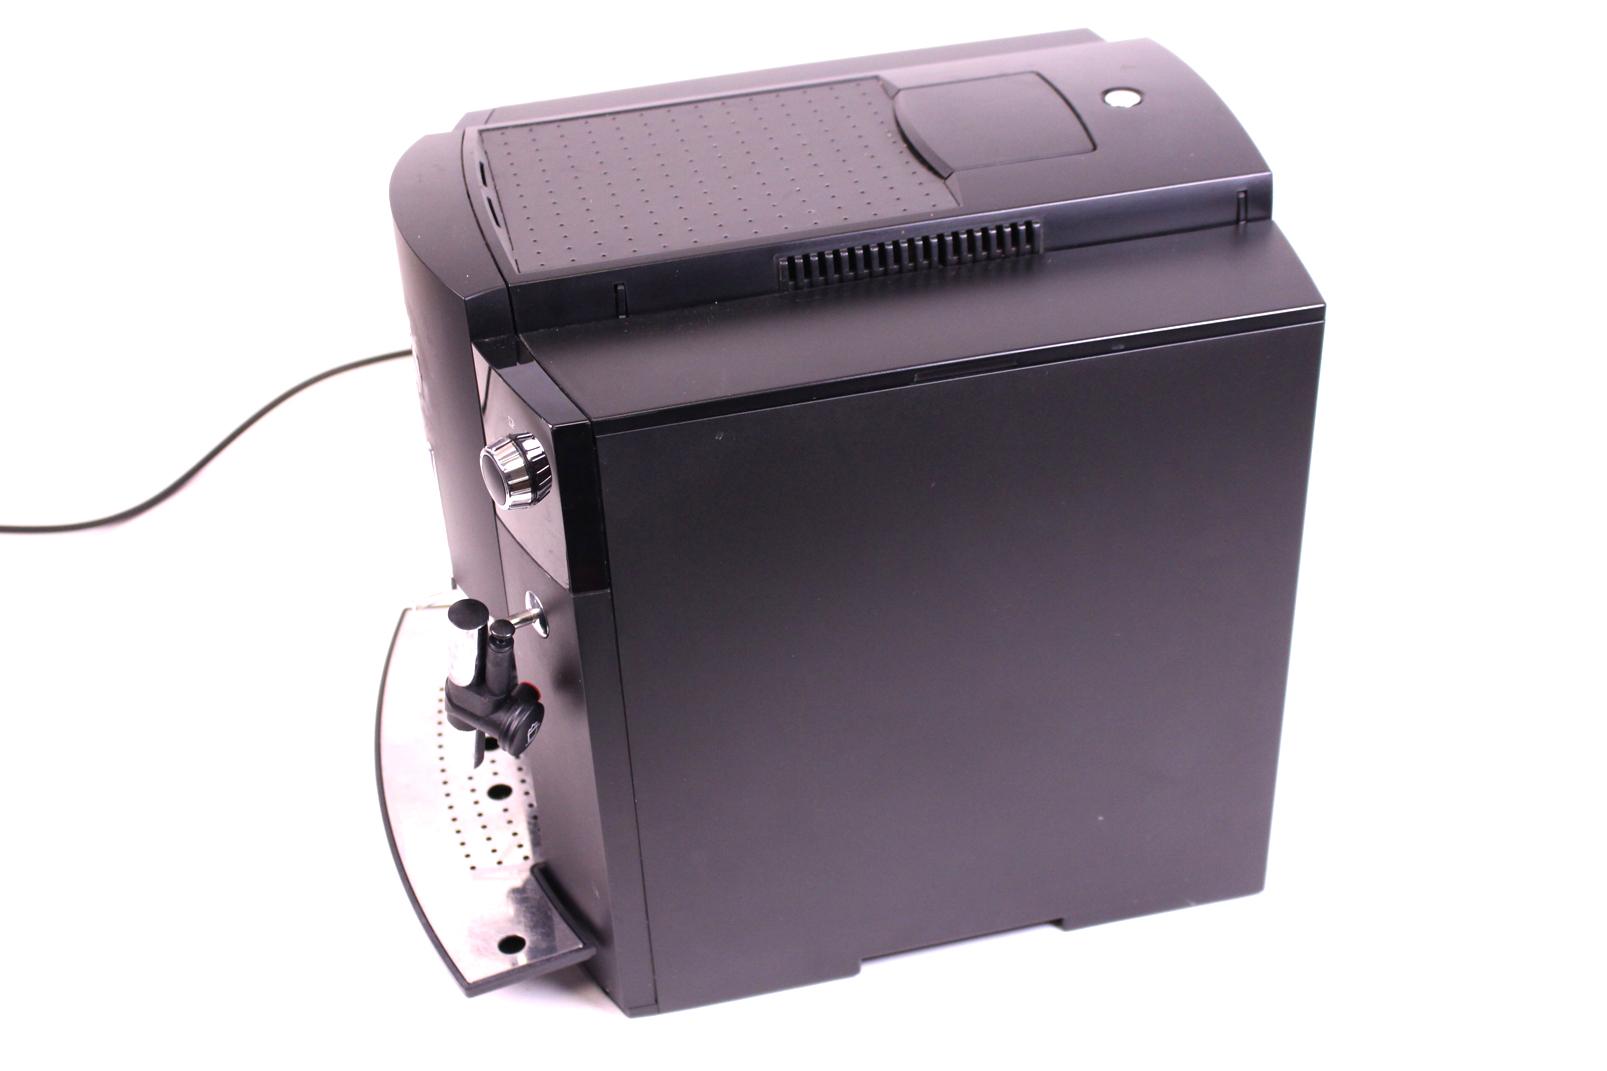 jura impressa c5 kaffeevollautomat 8 tassen kaffeemaschine kaffeeautomat black 7610917133055 ebay. Black Bedroom Furniture Sets. Home Design Ideas